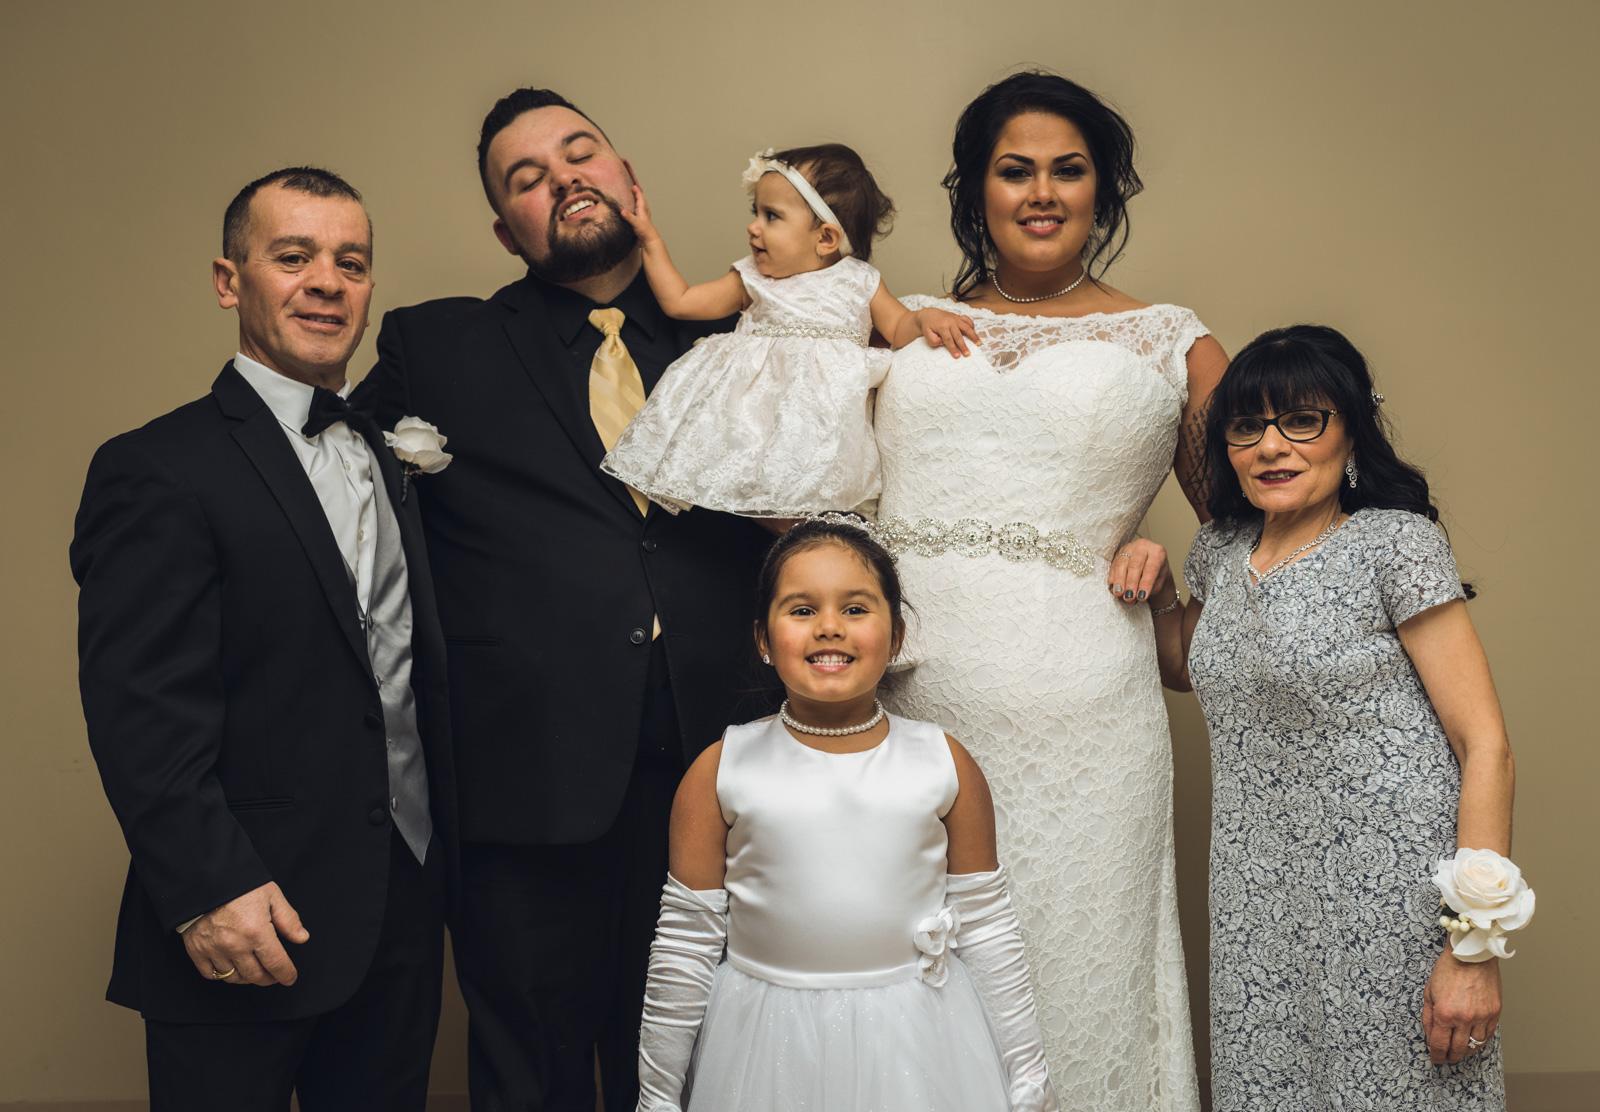 rheana-chris-wedding-blog-183.jpg